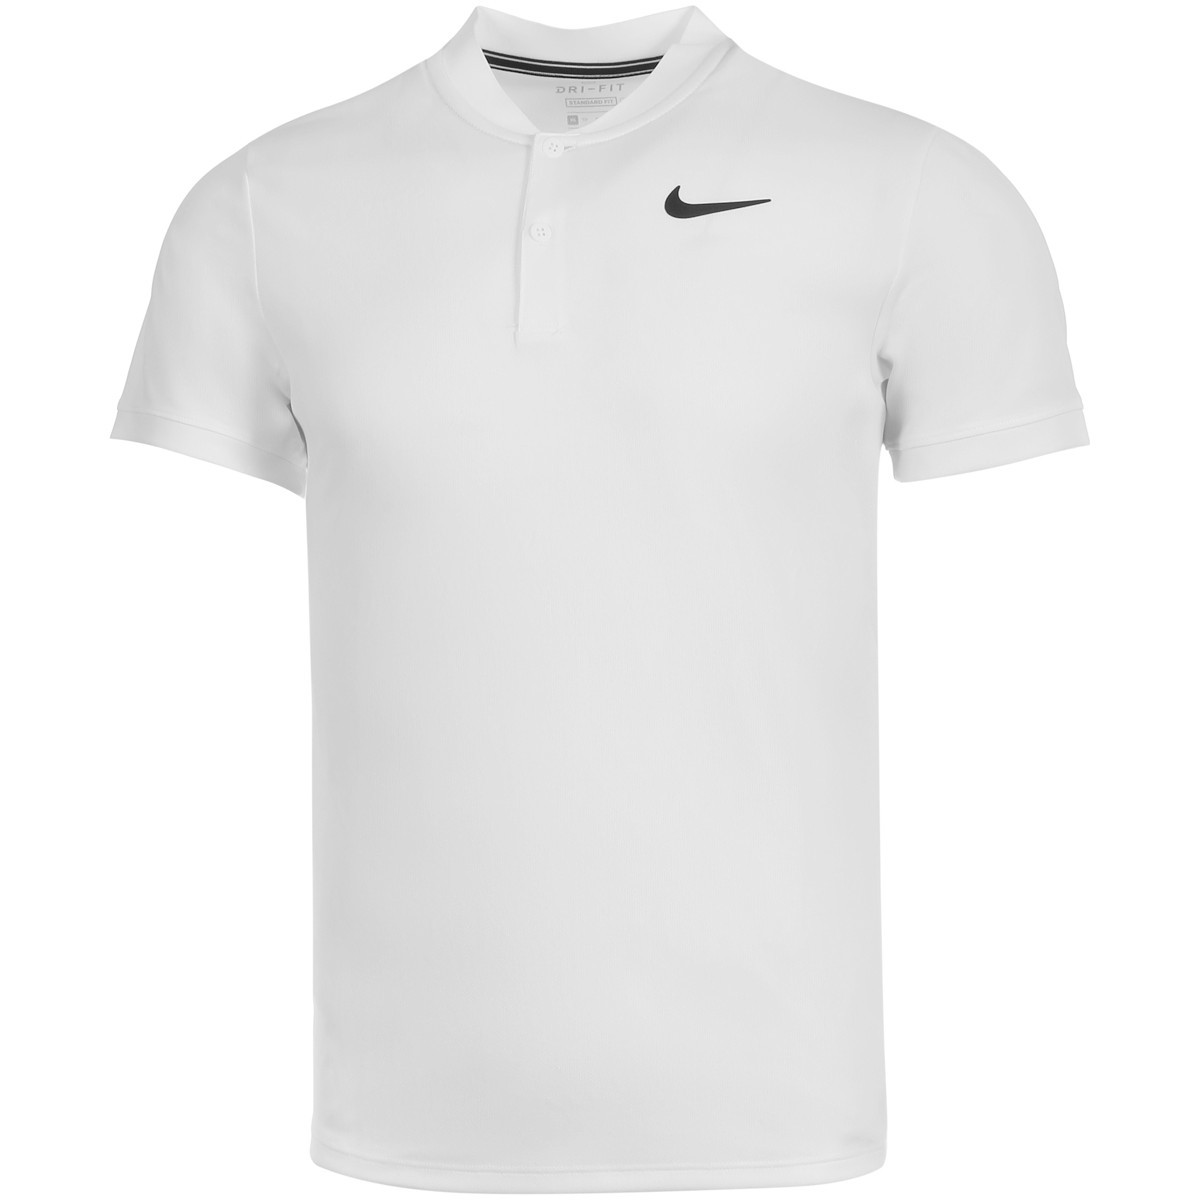 Camisa Polo Nike Court Blade Masculina  - Ferron Sport